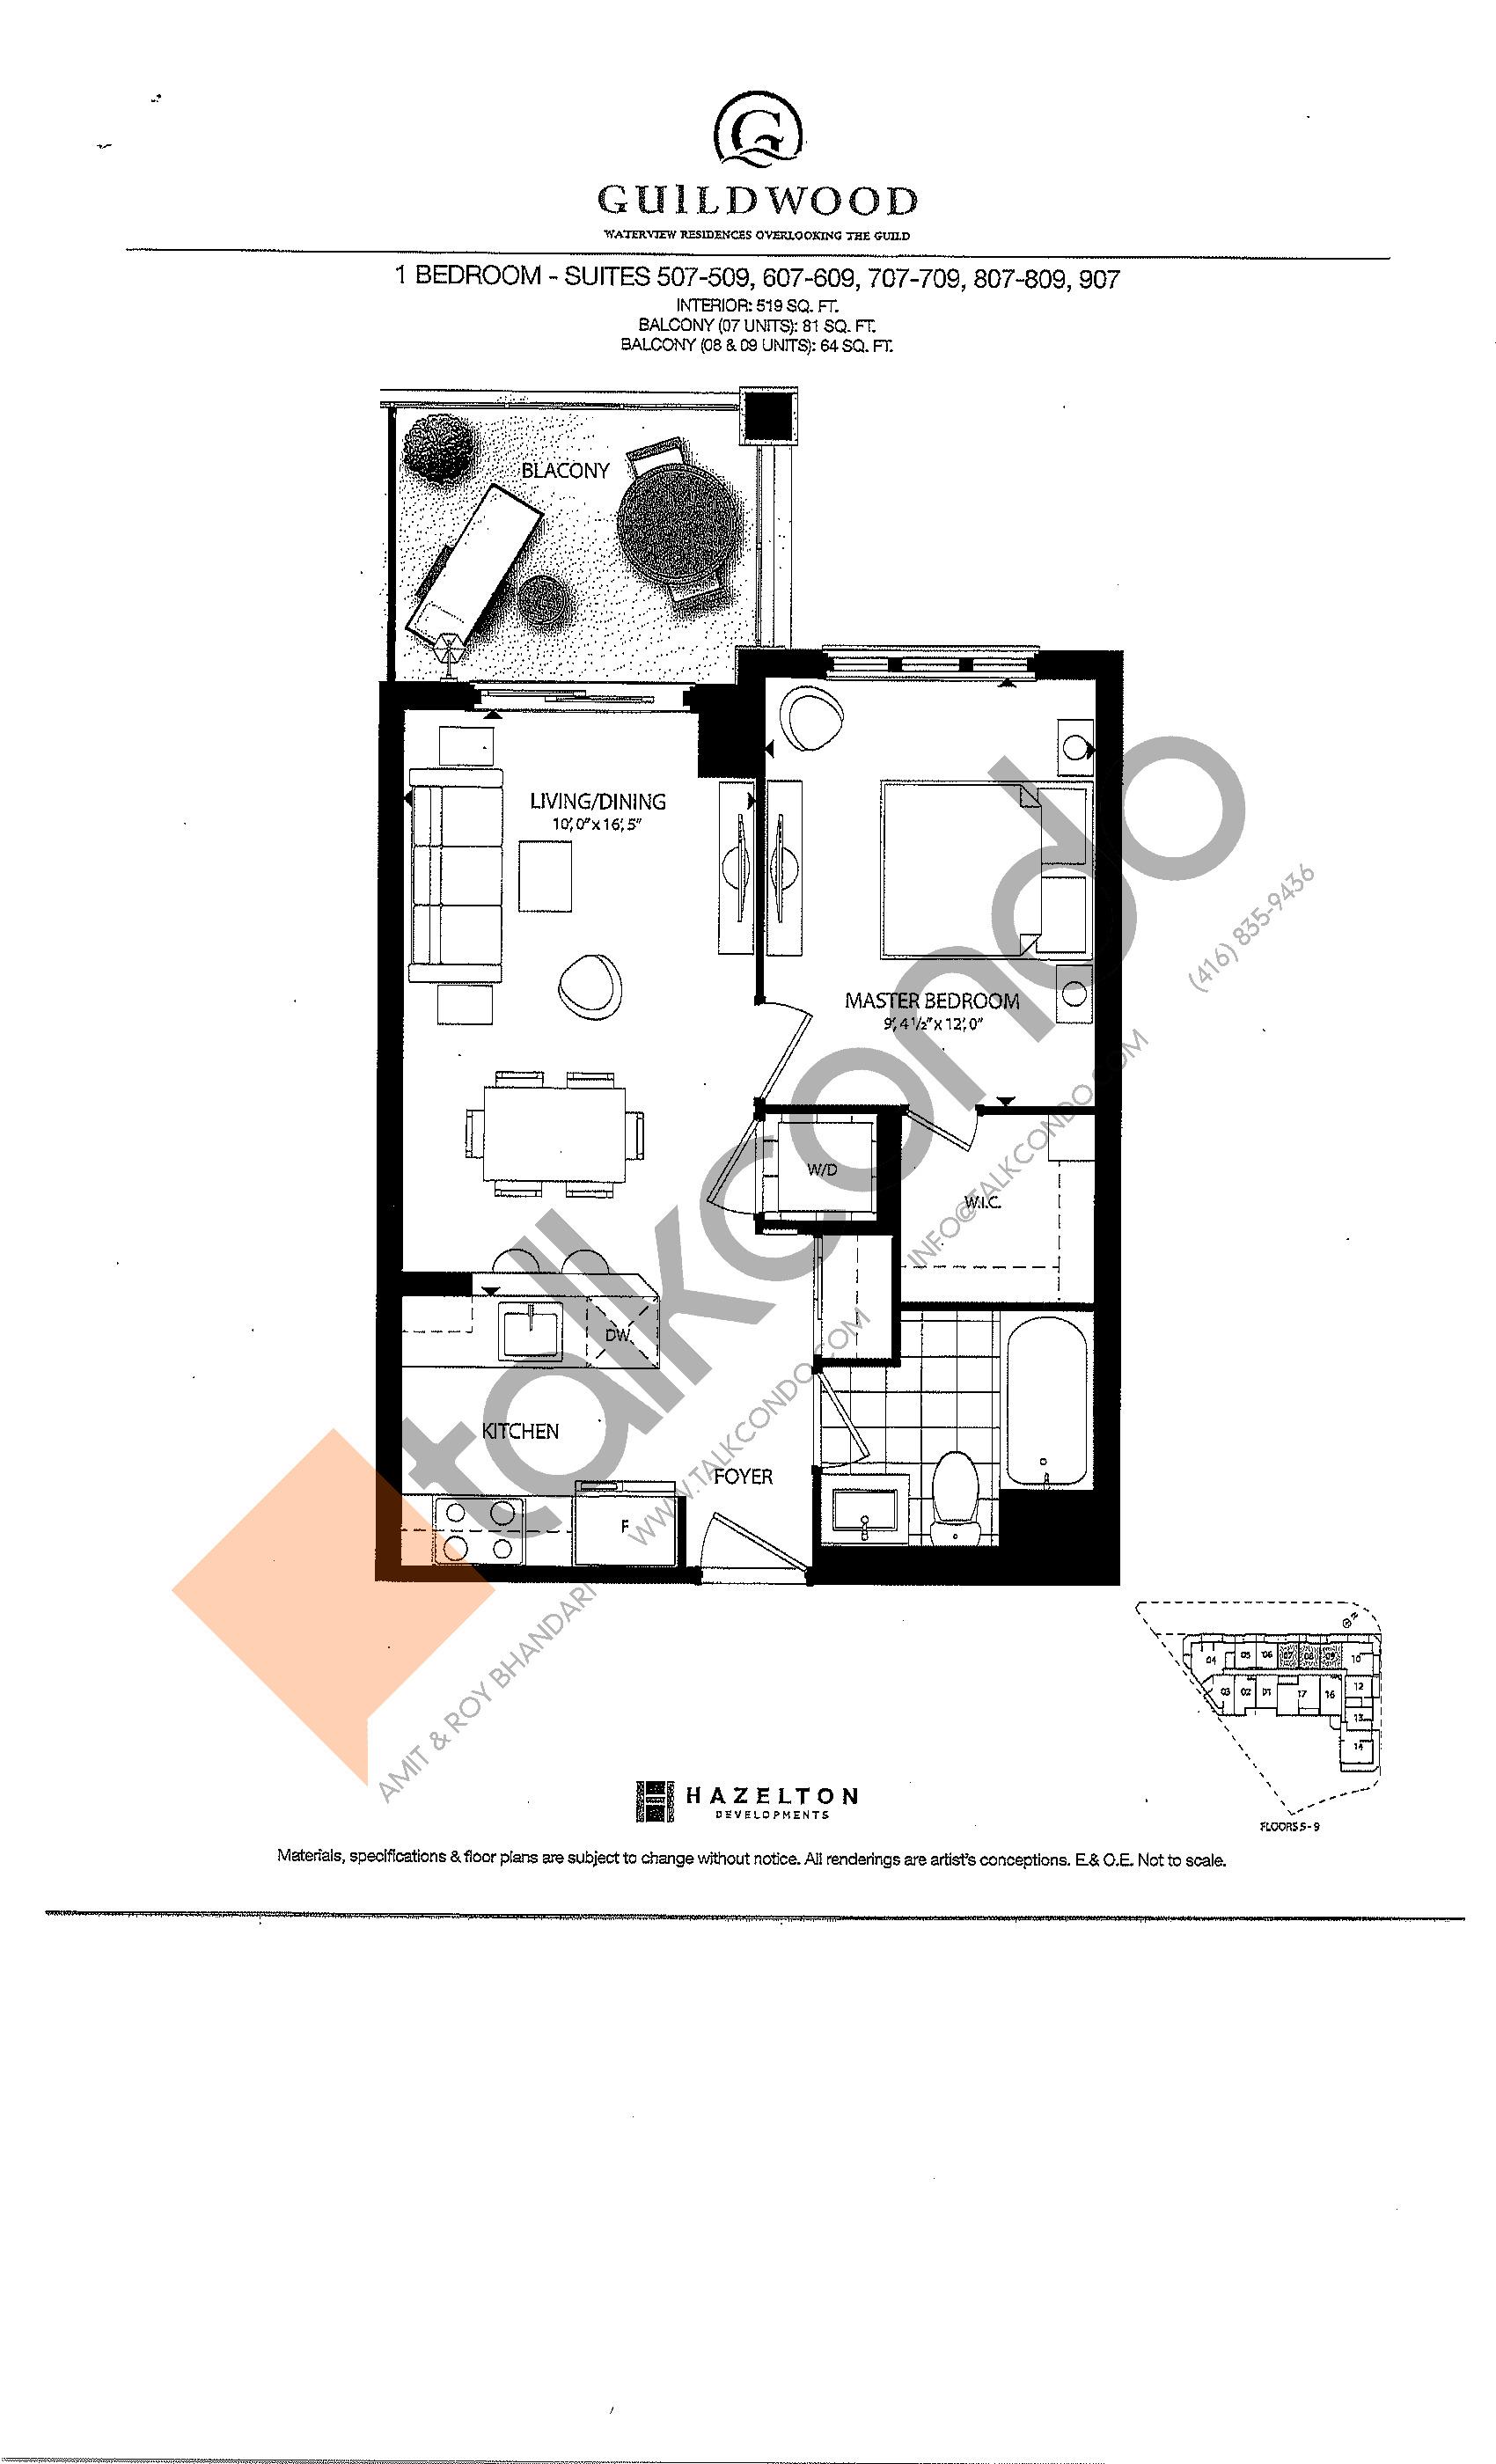 Suites 507-509, 607-609, 707-709, 807-809, 907 Floor Plan at Guildwood Condos - 519 sq.ft